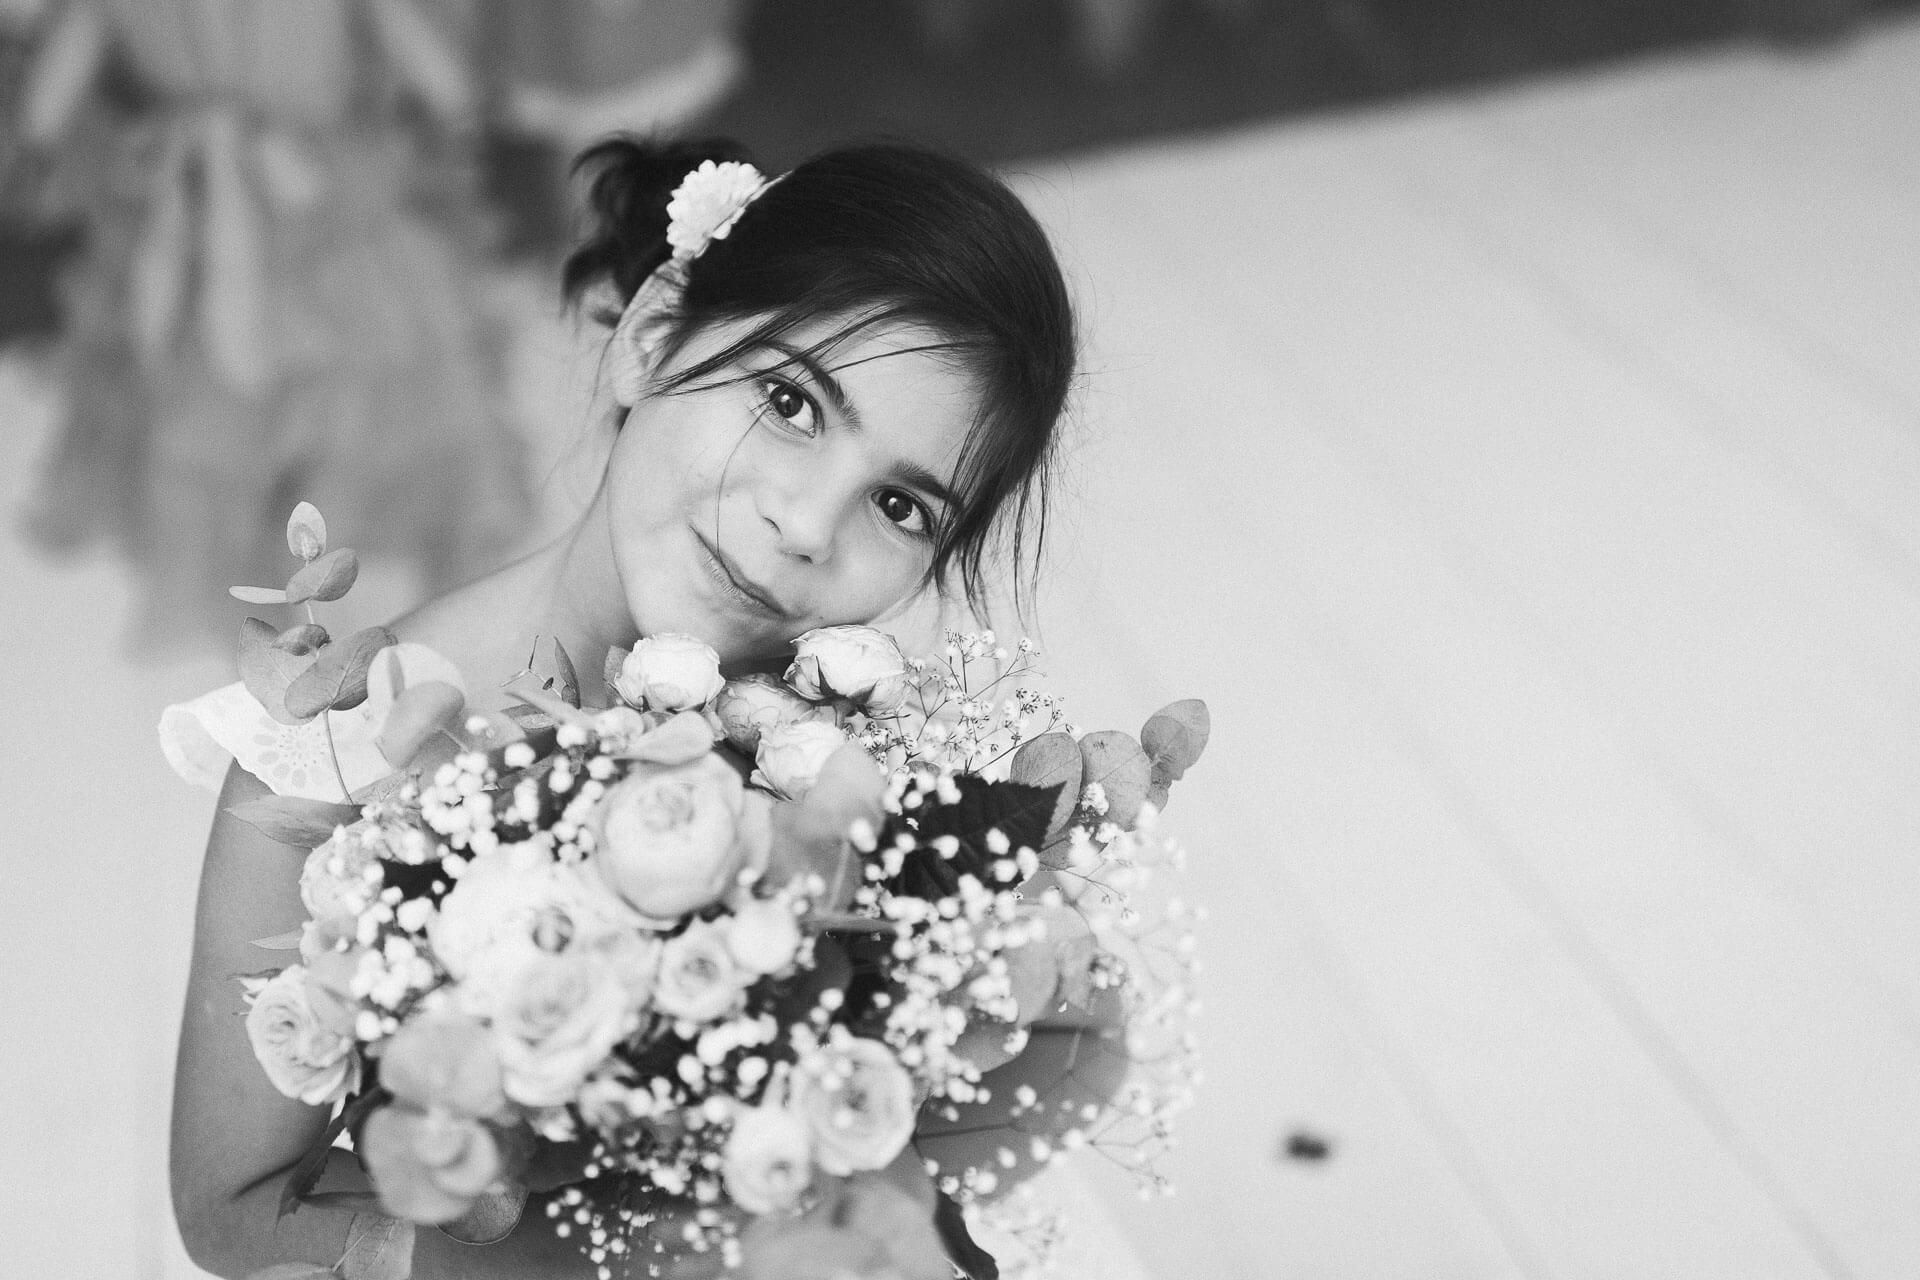 photographe-mariage-aix-en-provence-stephanie-jerome-26